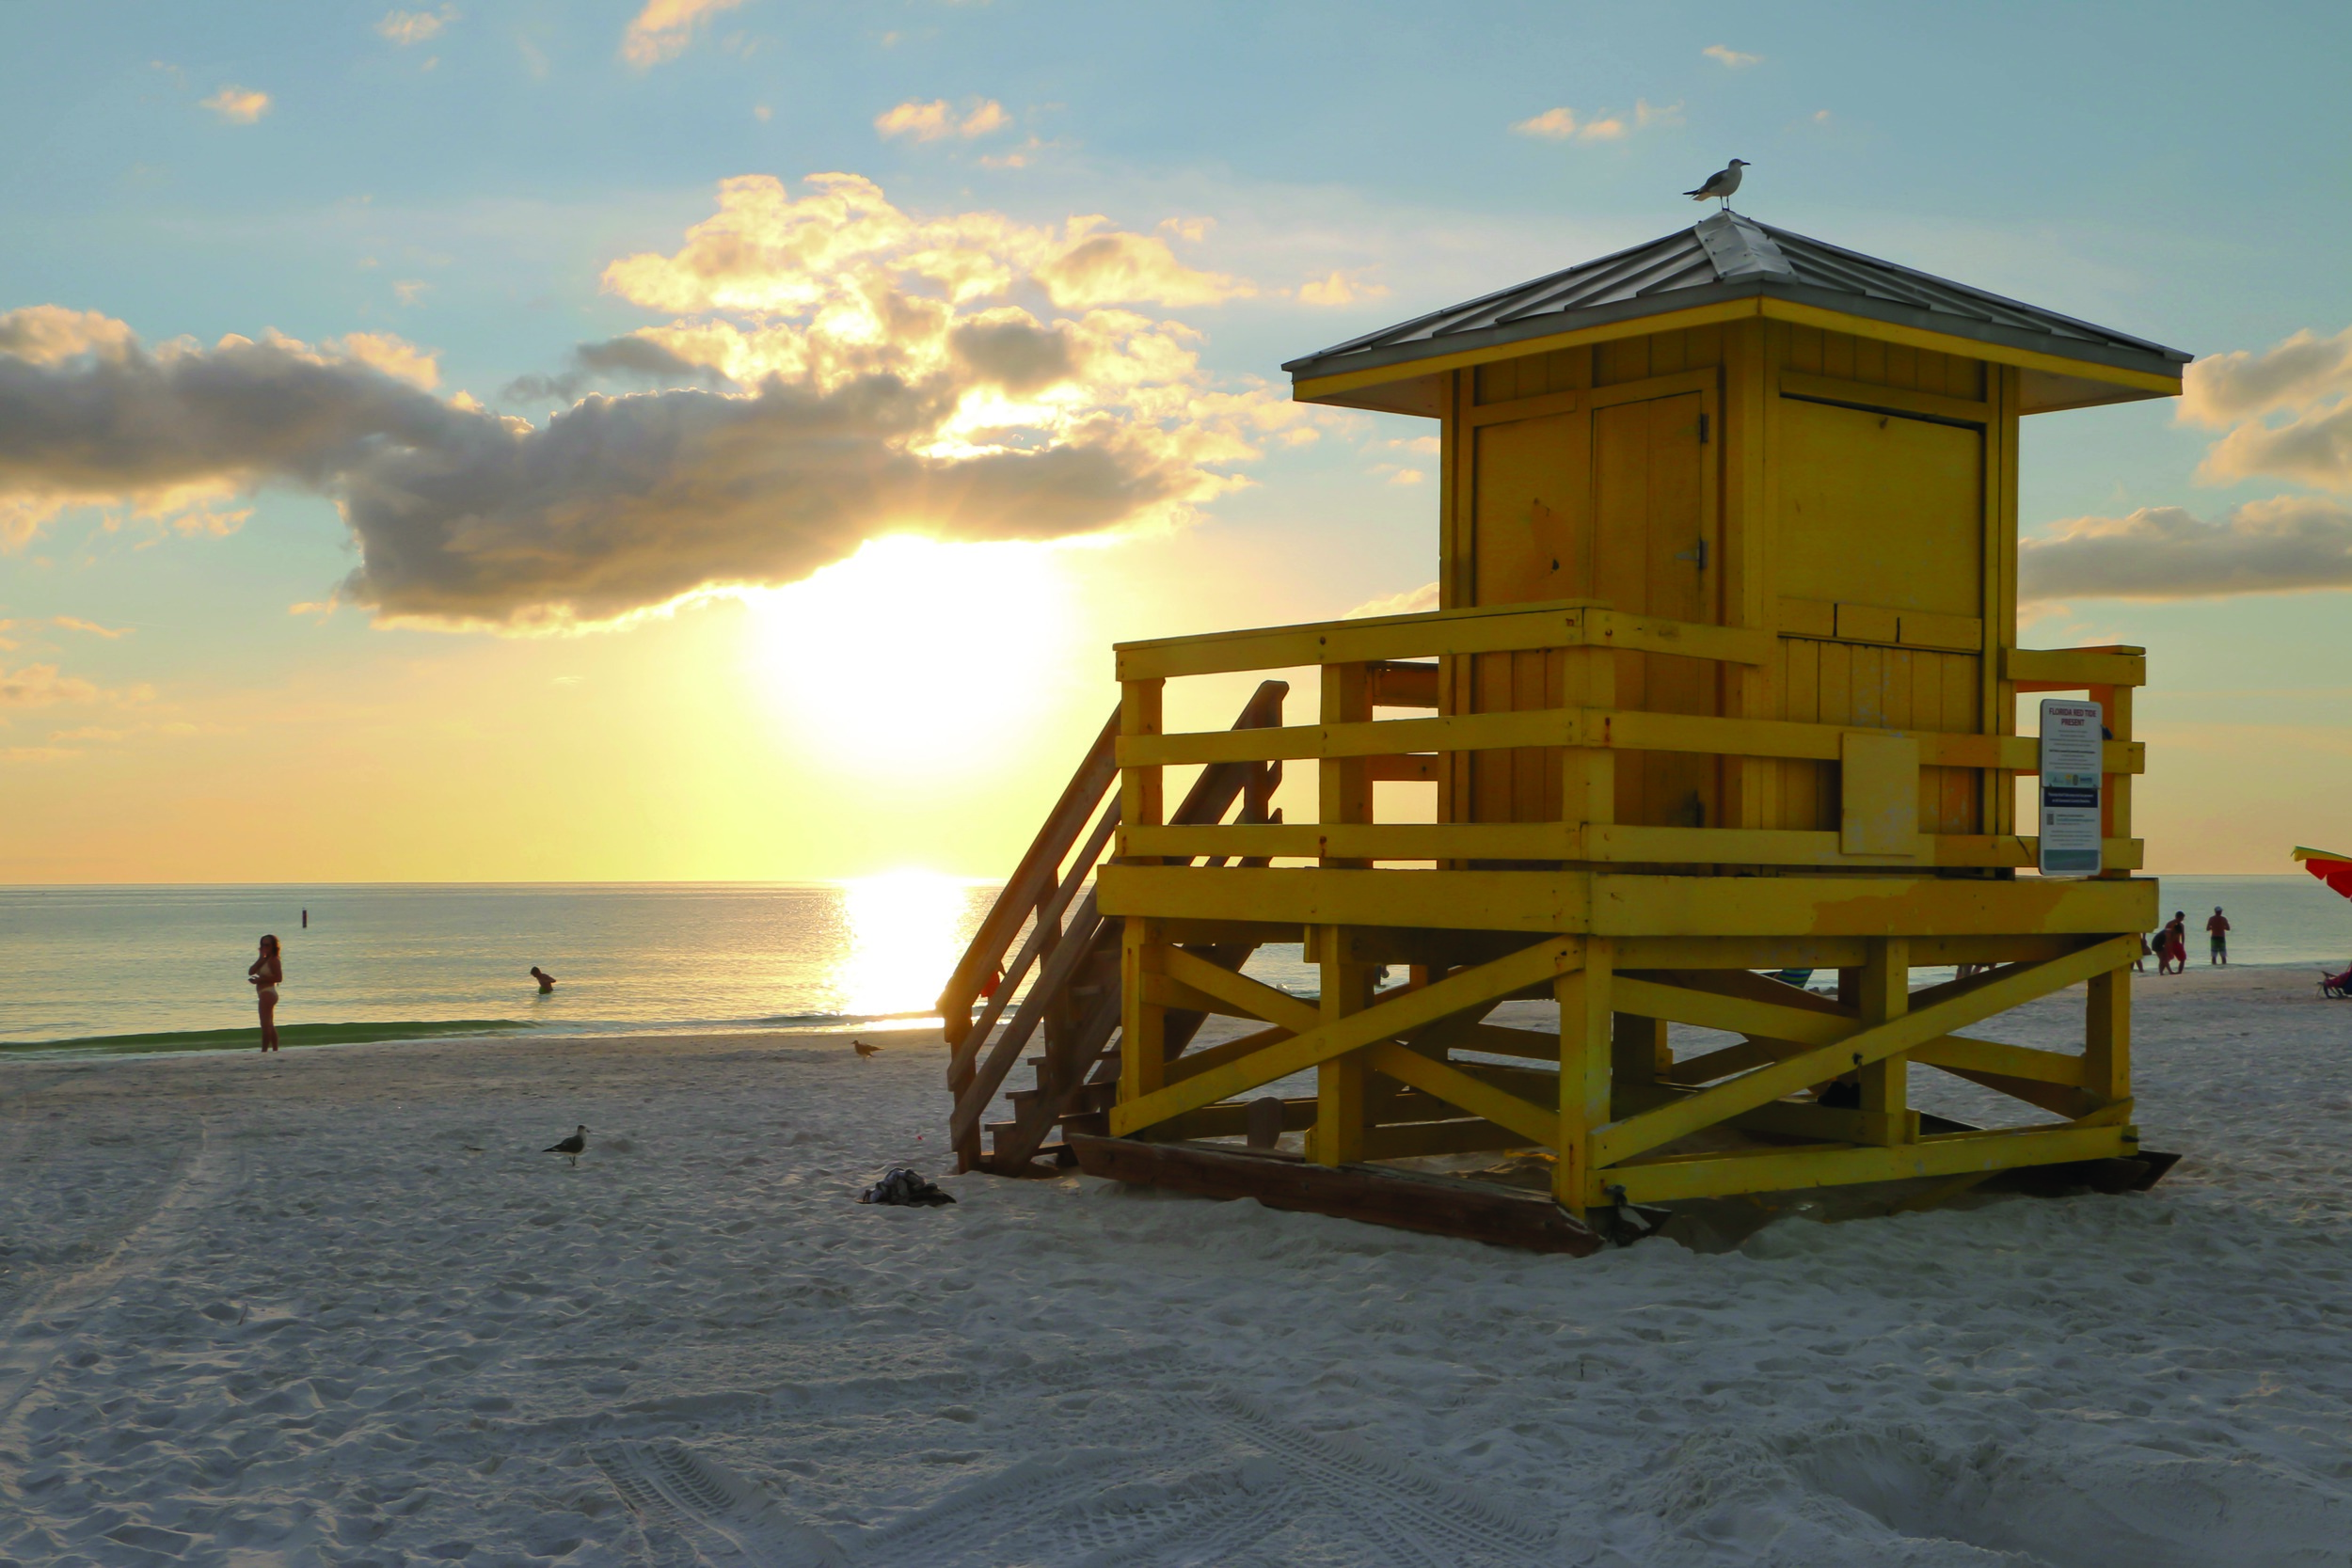 Photo Credit: VisitSarasota.org courtesy of Visit Sarasota County